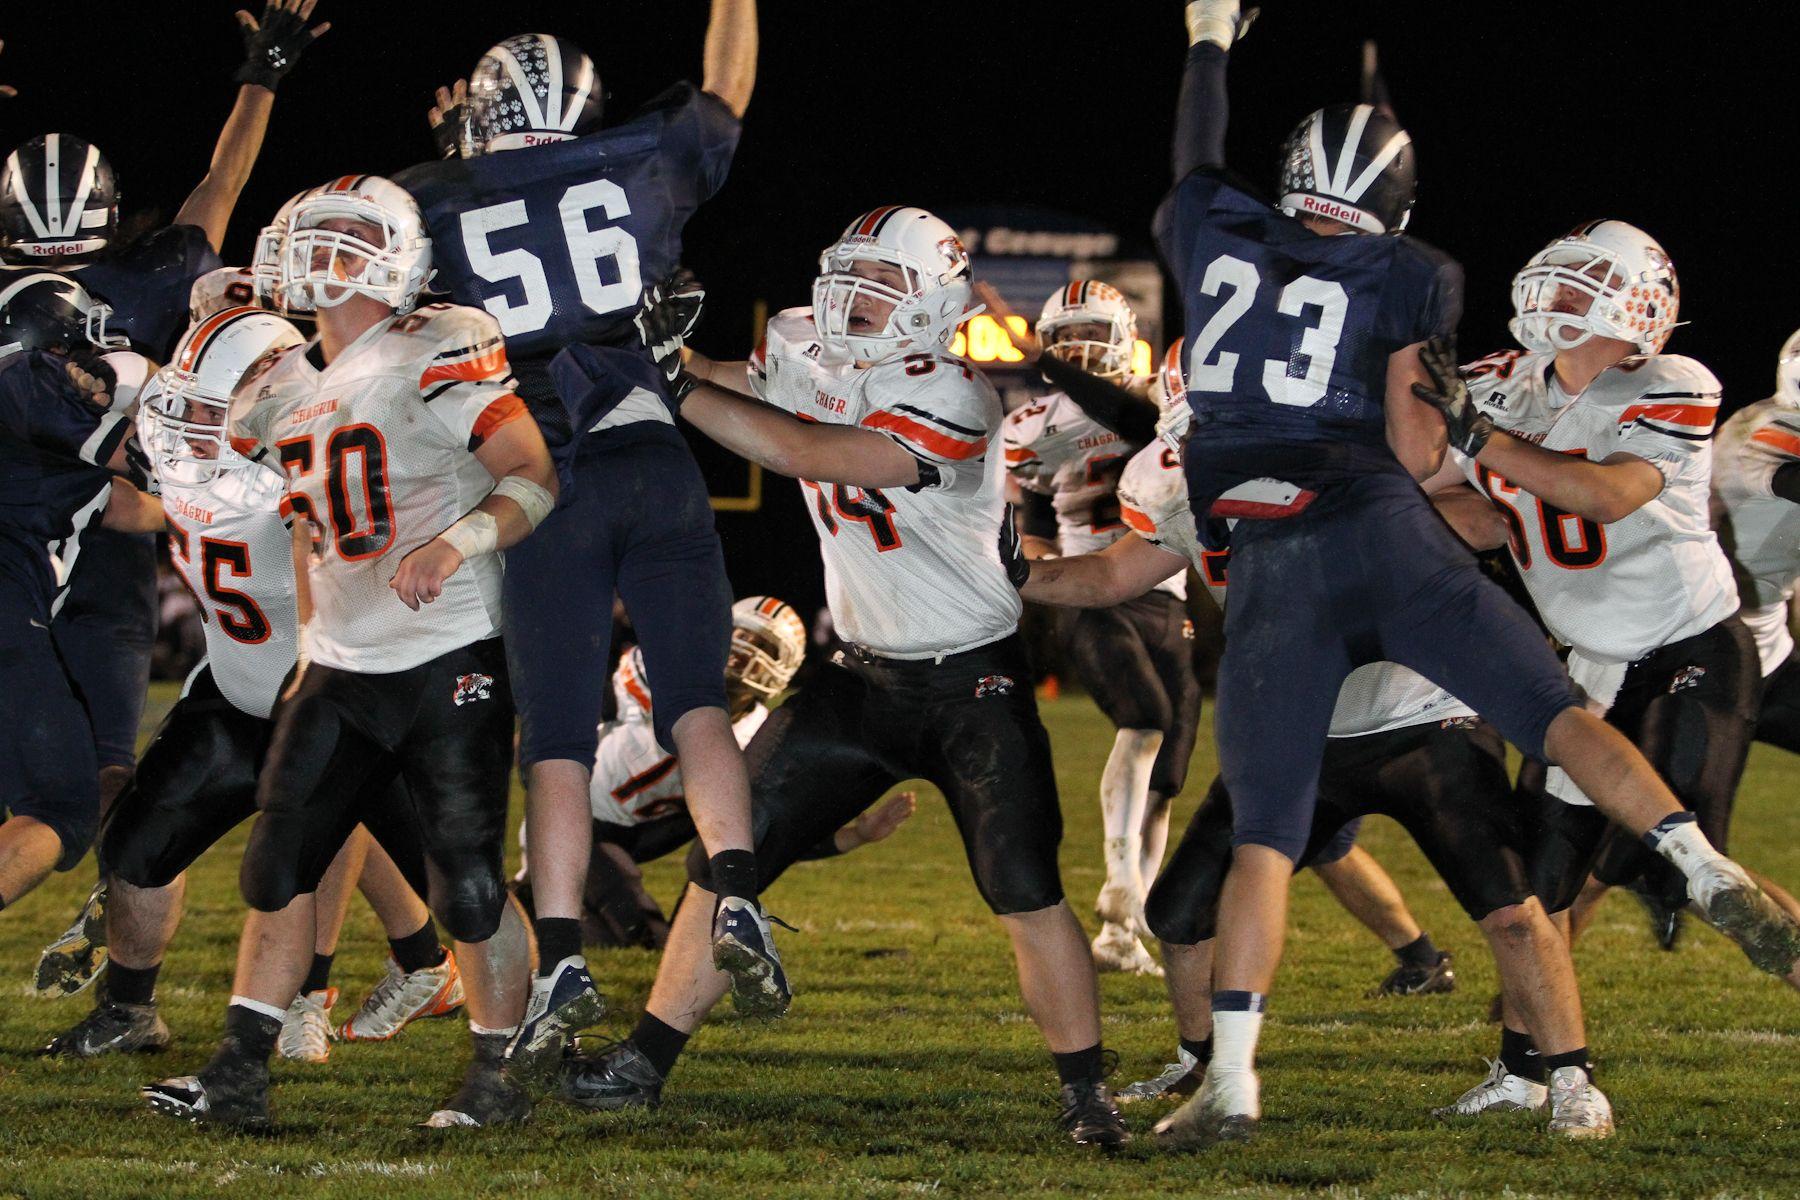 Boys Varsity Lacrosse - Chagrin Falls High School ...  |Chagrin Falls Tigers